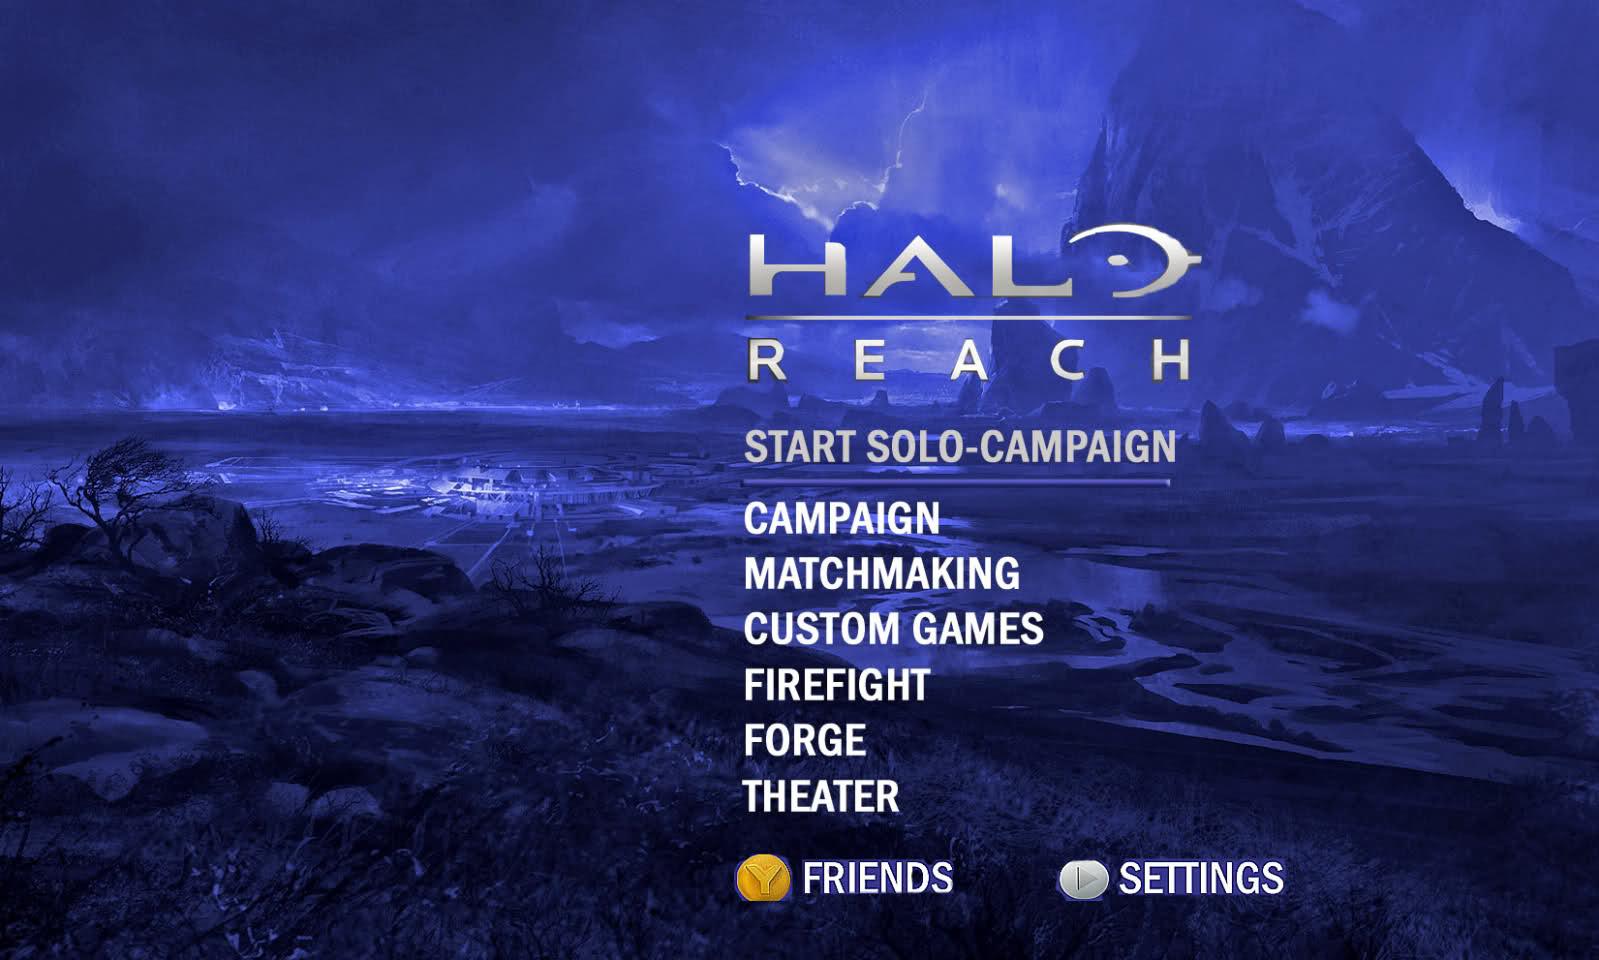 Halo Reach matchmaking miten se toimii